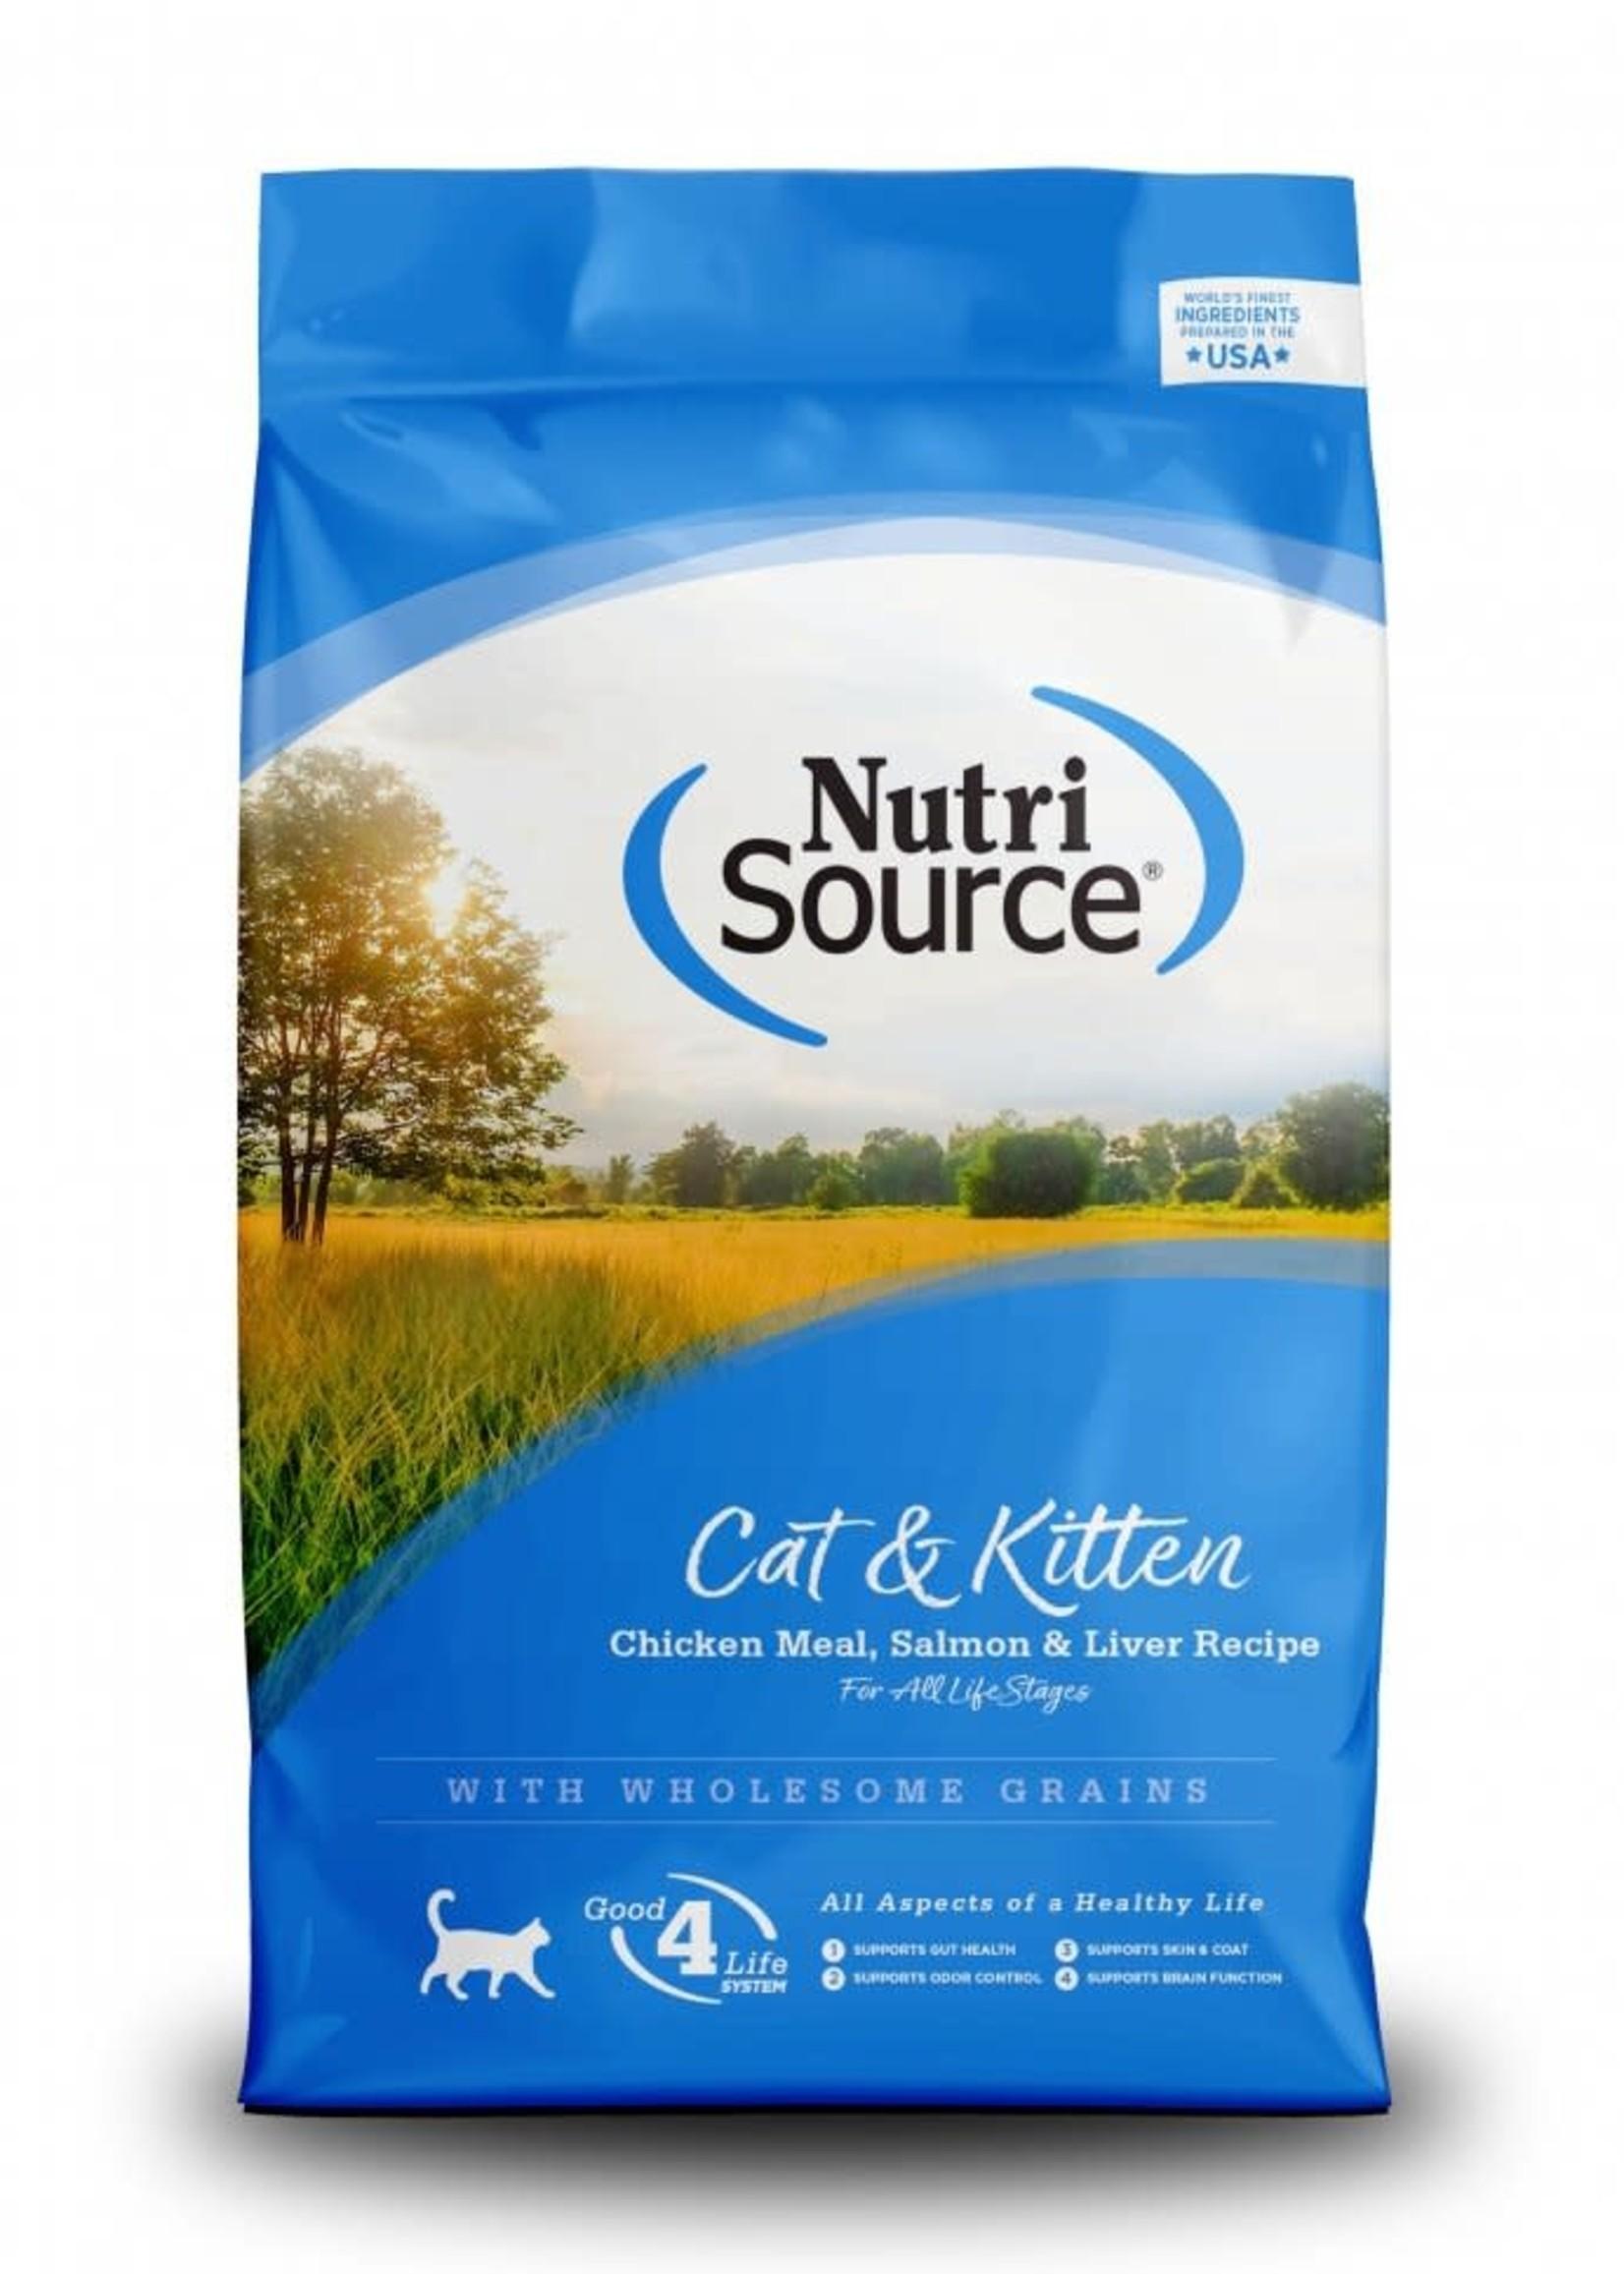 Nutrisource NutriSource Cat & Kitten Chicken, Salmon &  Liver Dry Cat Food 16lbs